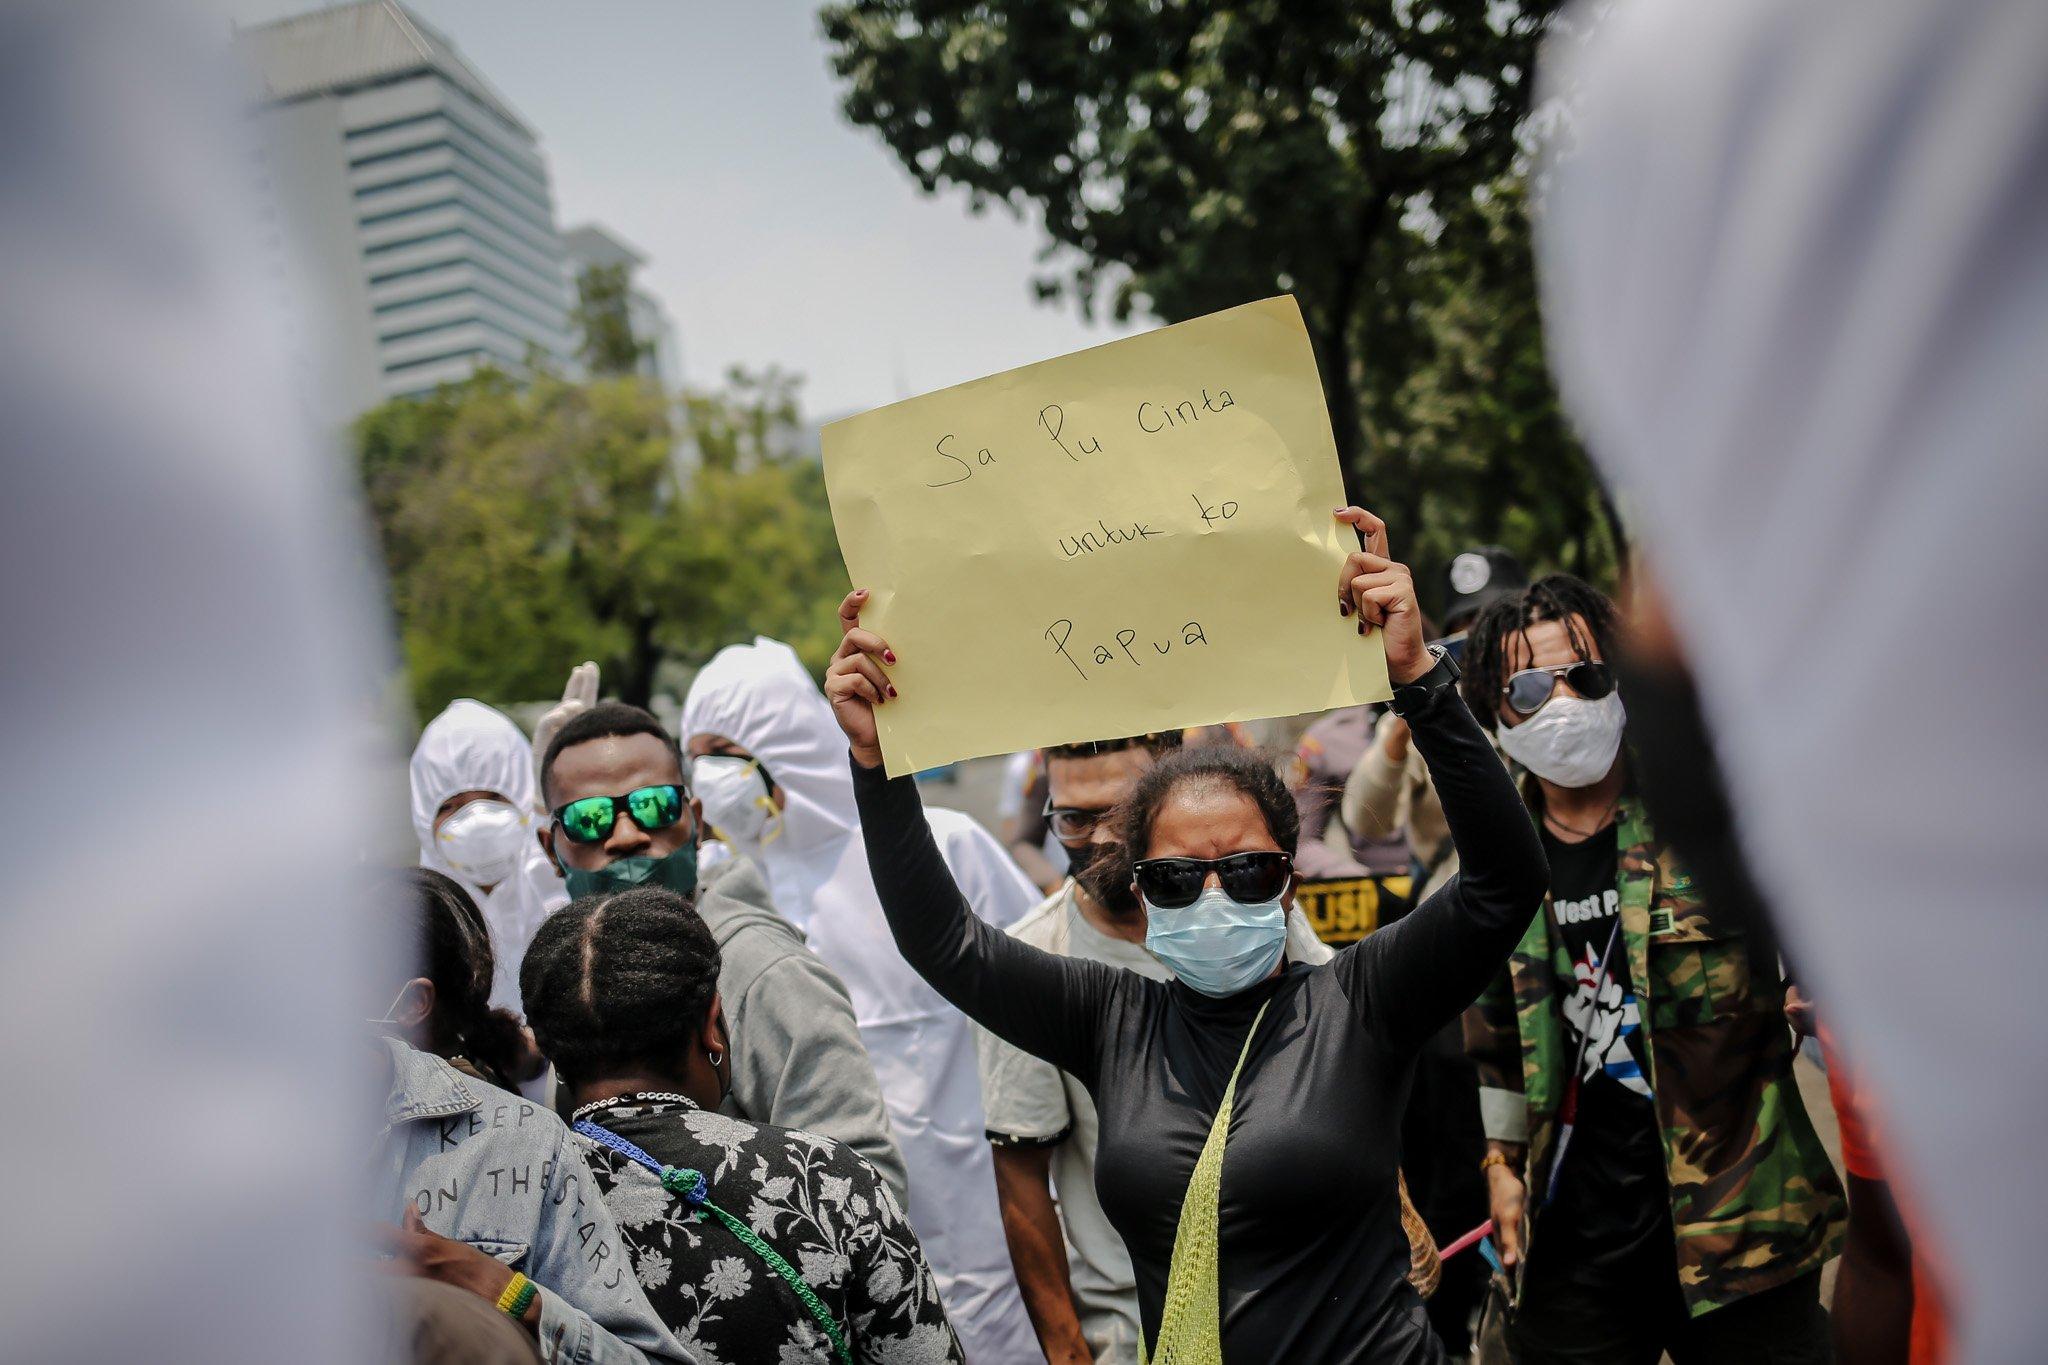 Sejumlah pengunjuk rasa yang tergabung dalam Aliansi Mahasiswa Papua (AMP) mengangkat poster bertuliskan kecintaan terhadap tanah Papua saat aksi unjuk rasa peringatan Roma Agreement ke-59 di Depan Kedutaan Amerika Serikat, Jakarta, Kamis, (30/9/2021).